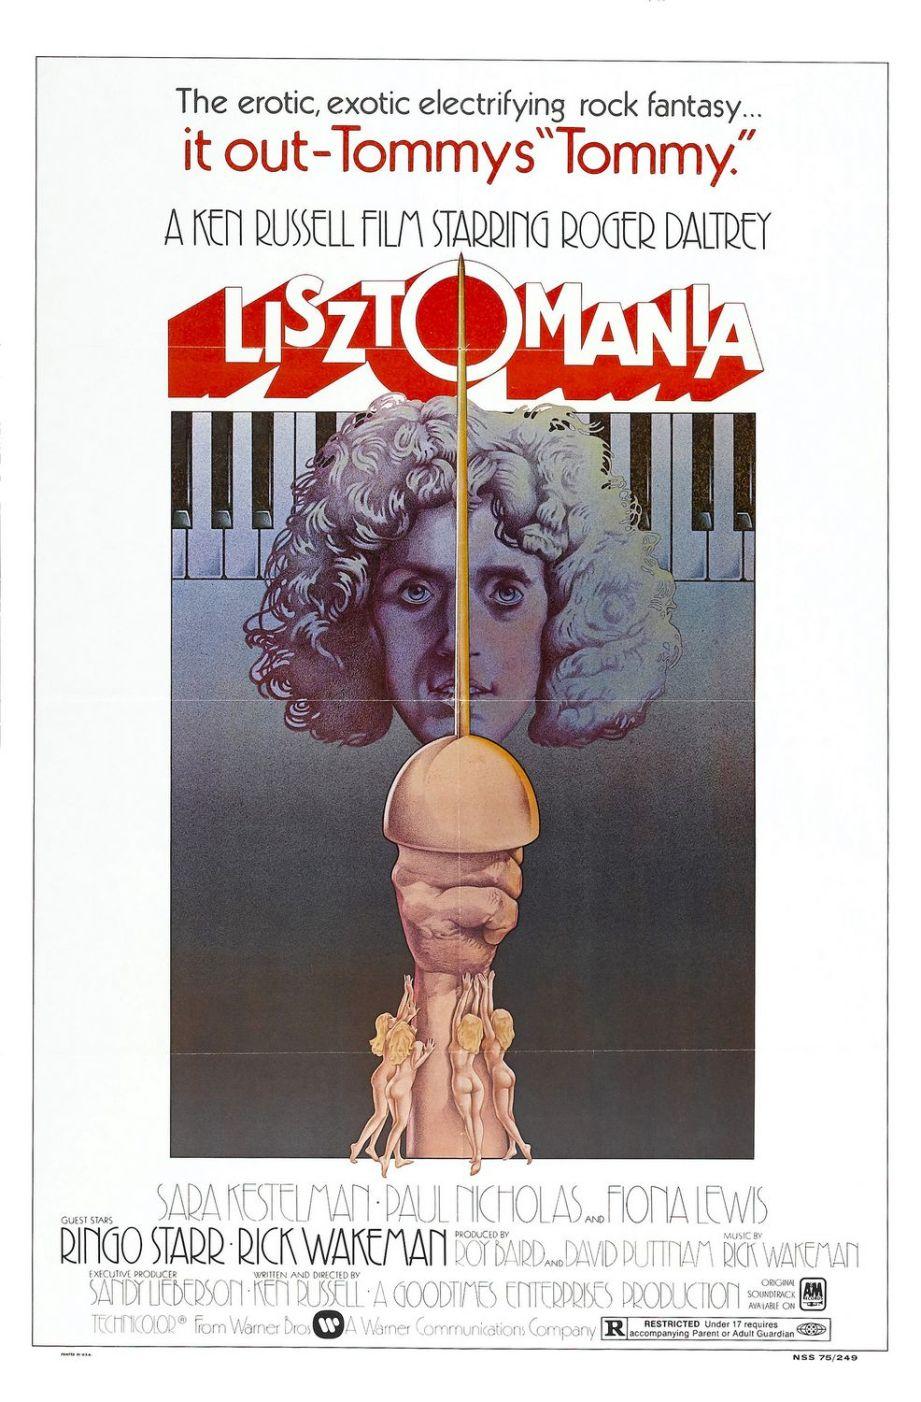 Uh, oh. Roger Daltrey is Franz Liszt. Ken Russell's LISZTOMANIA, 1975